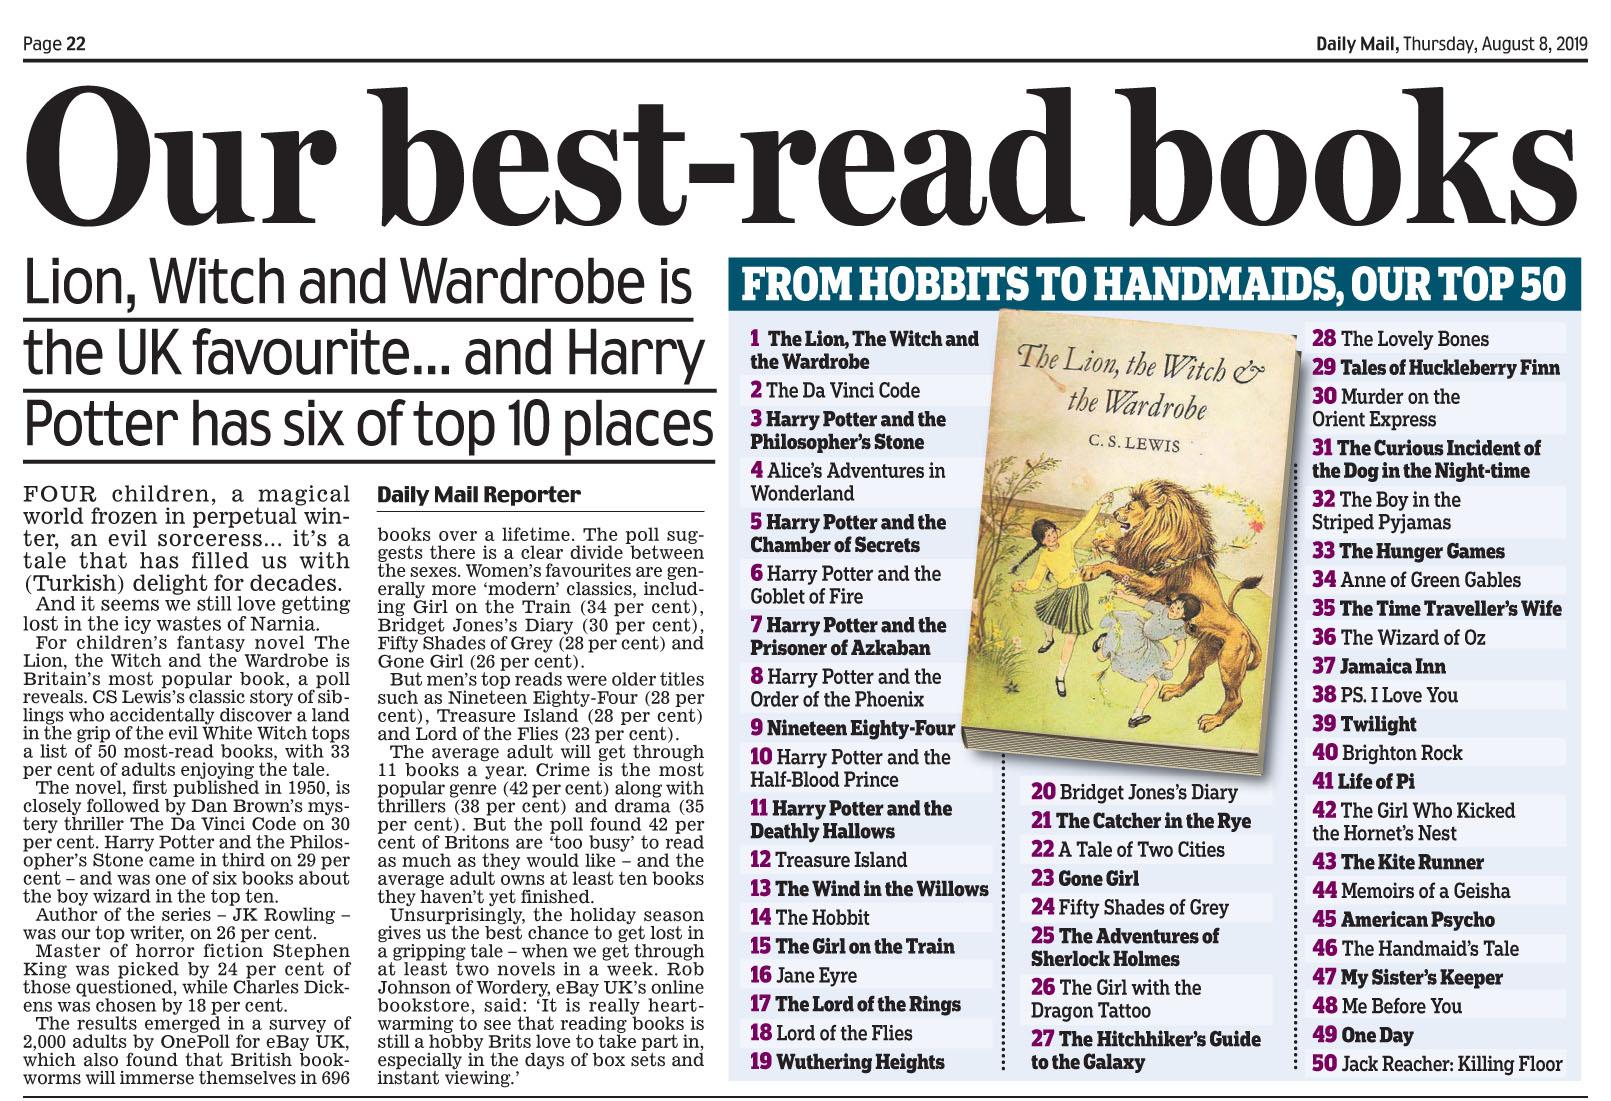 Daily Mail August 8 2019 Best British Books.jpg